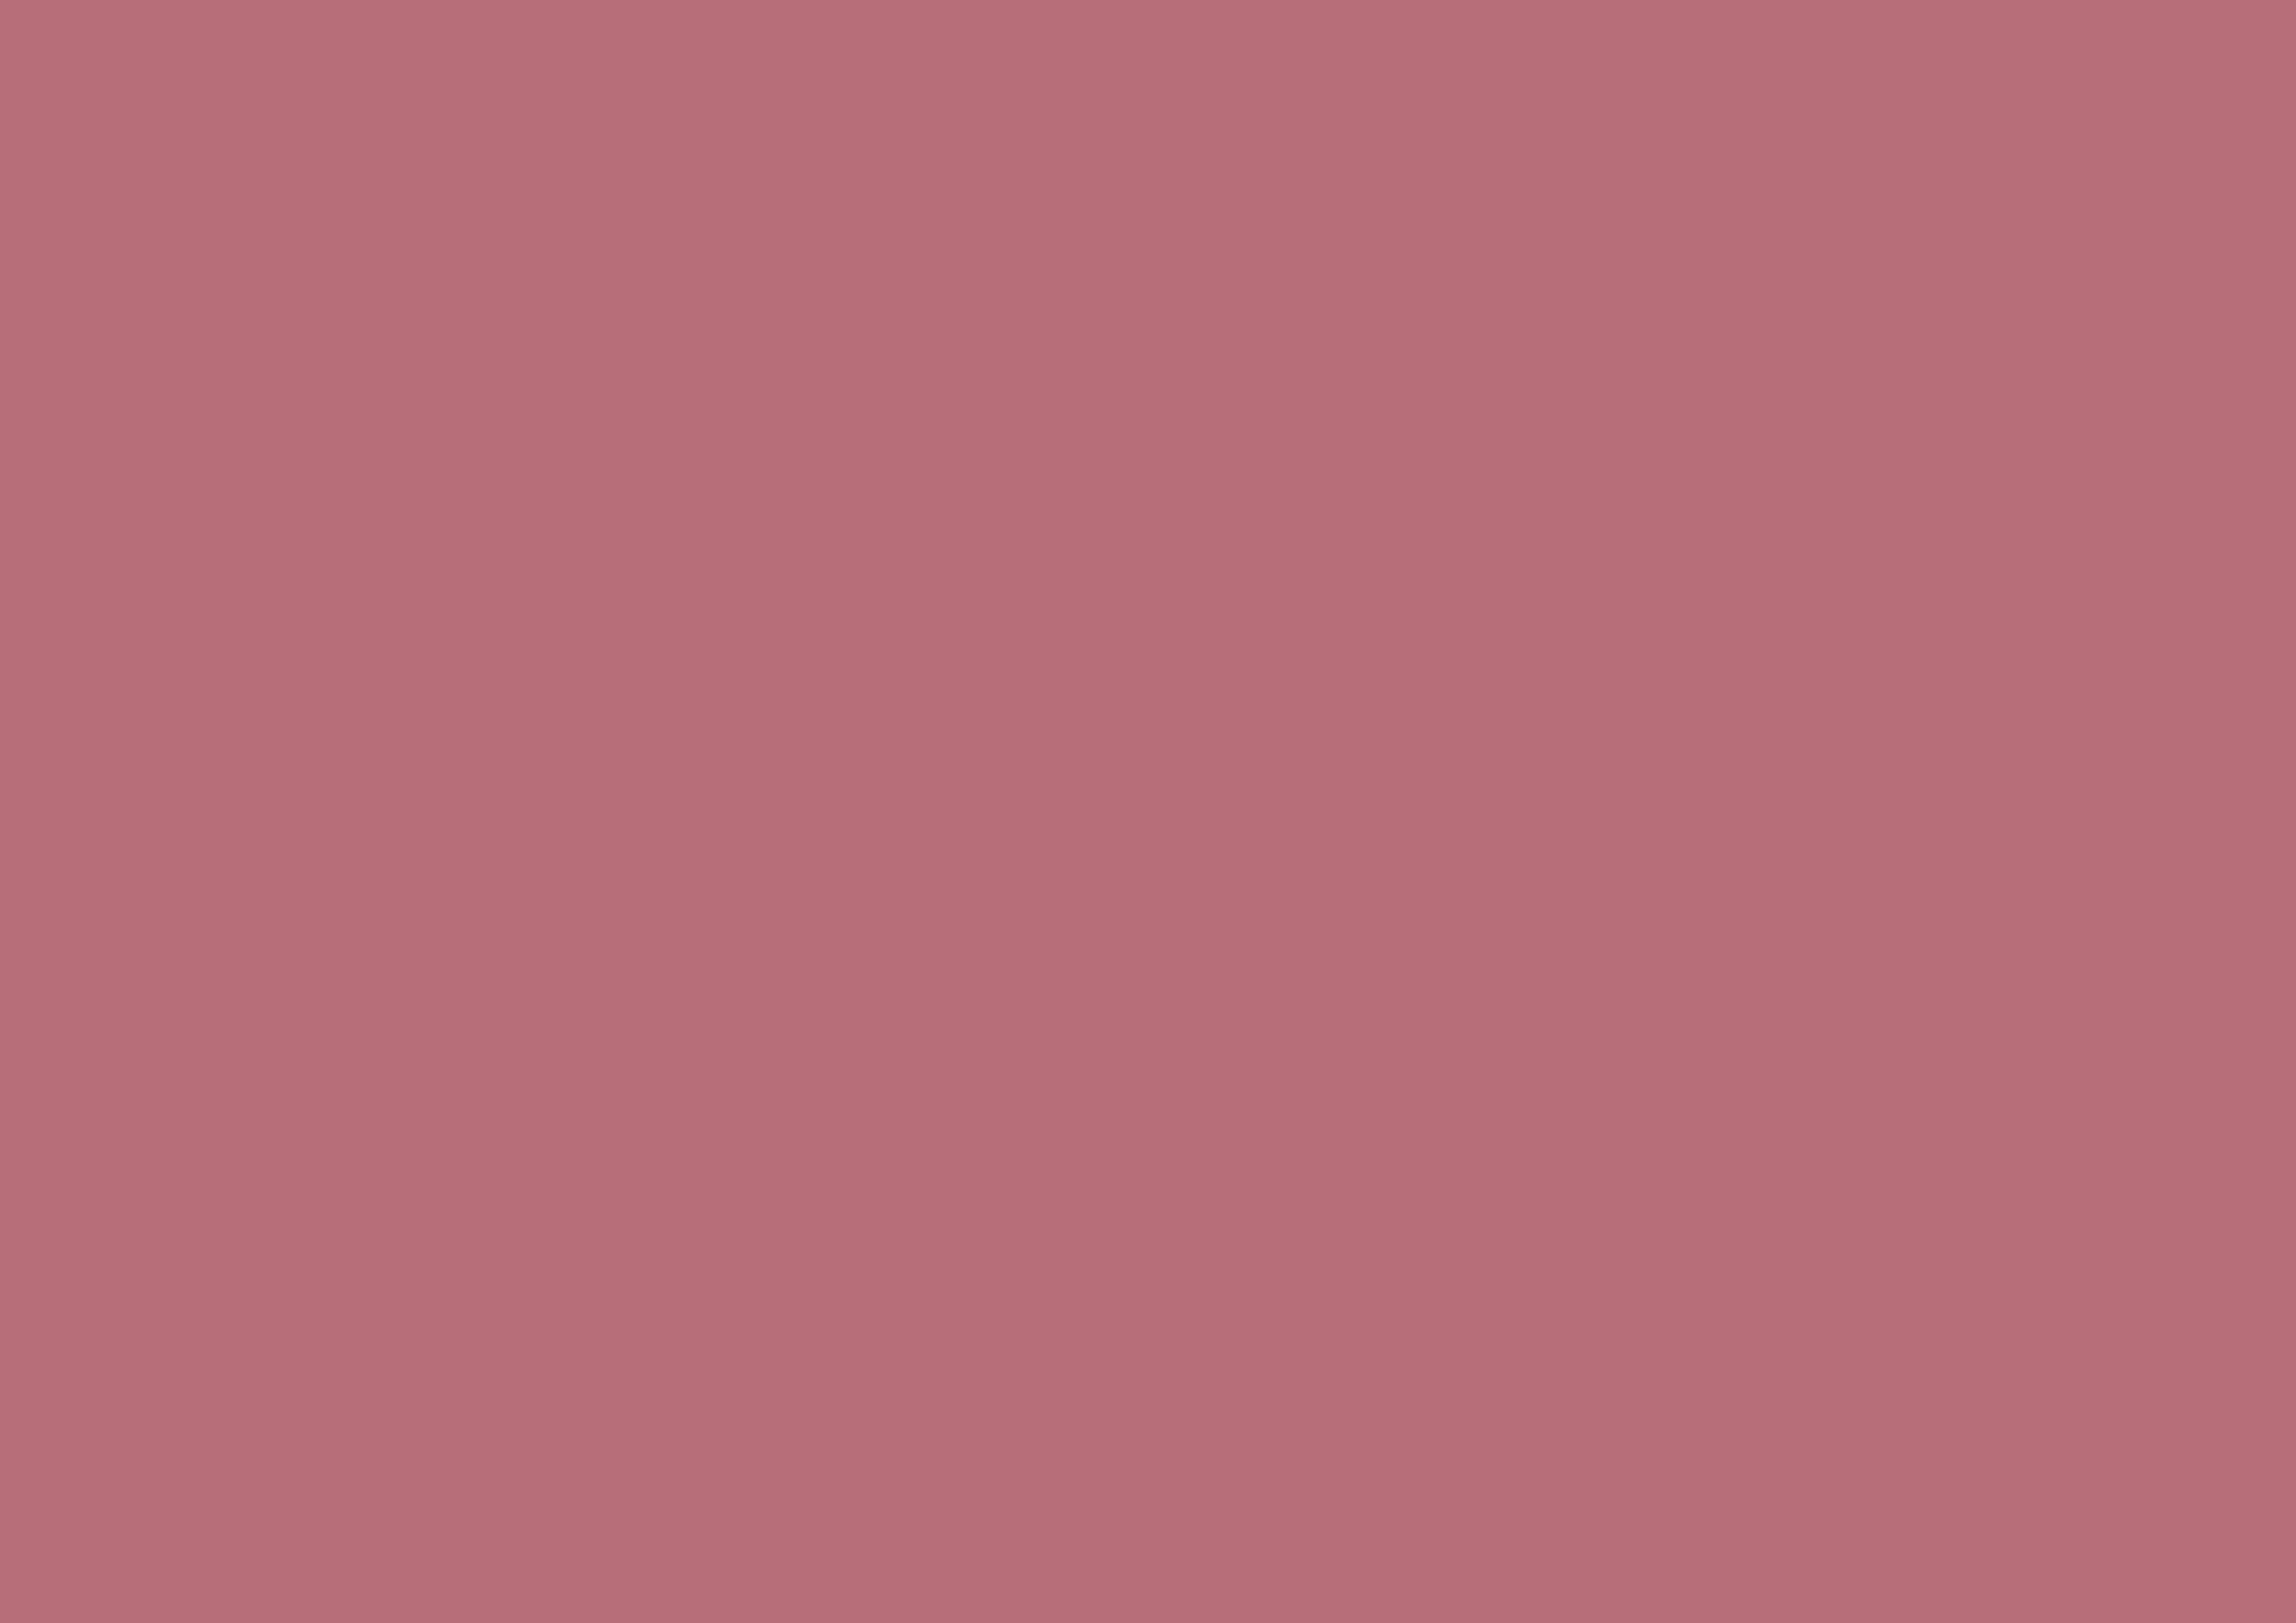 3508x2480 Rose Gold Solid Color Background